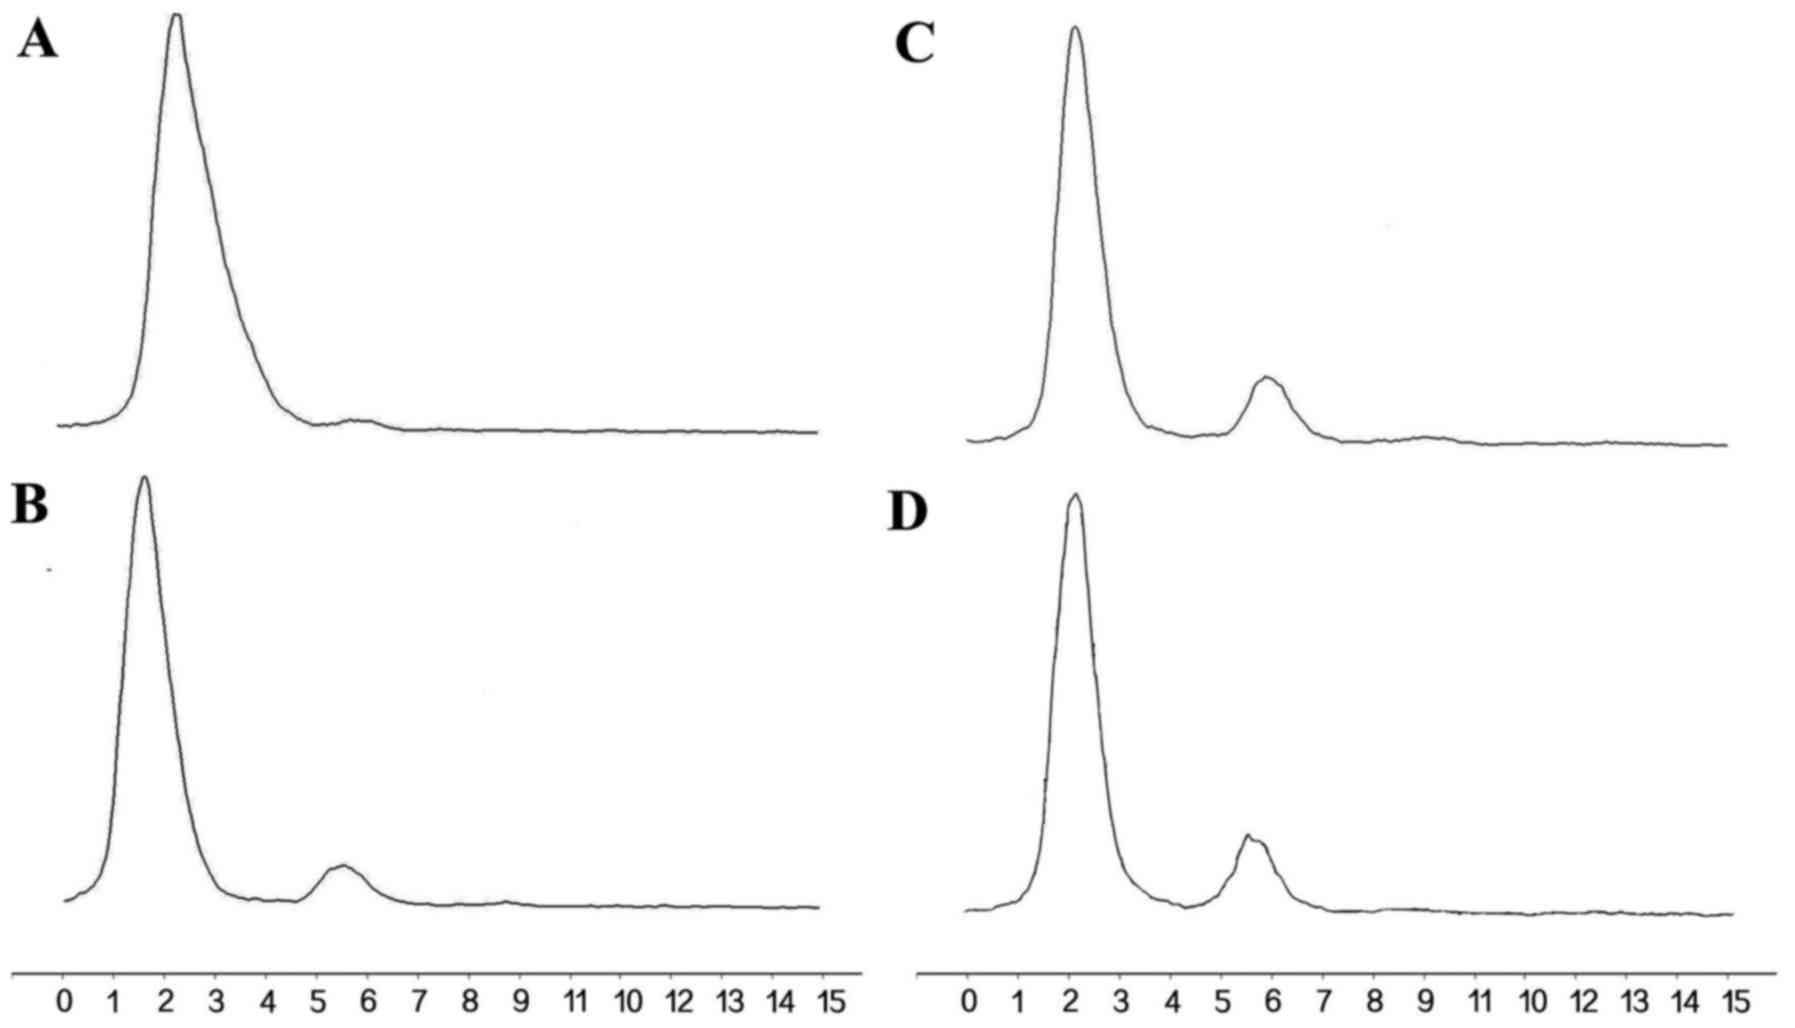 131I-labeled monoclonal antibody targeting neuropilin